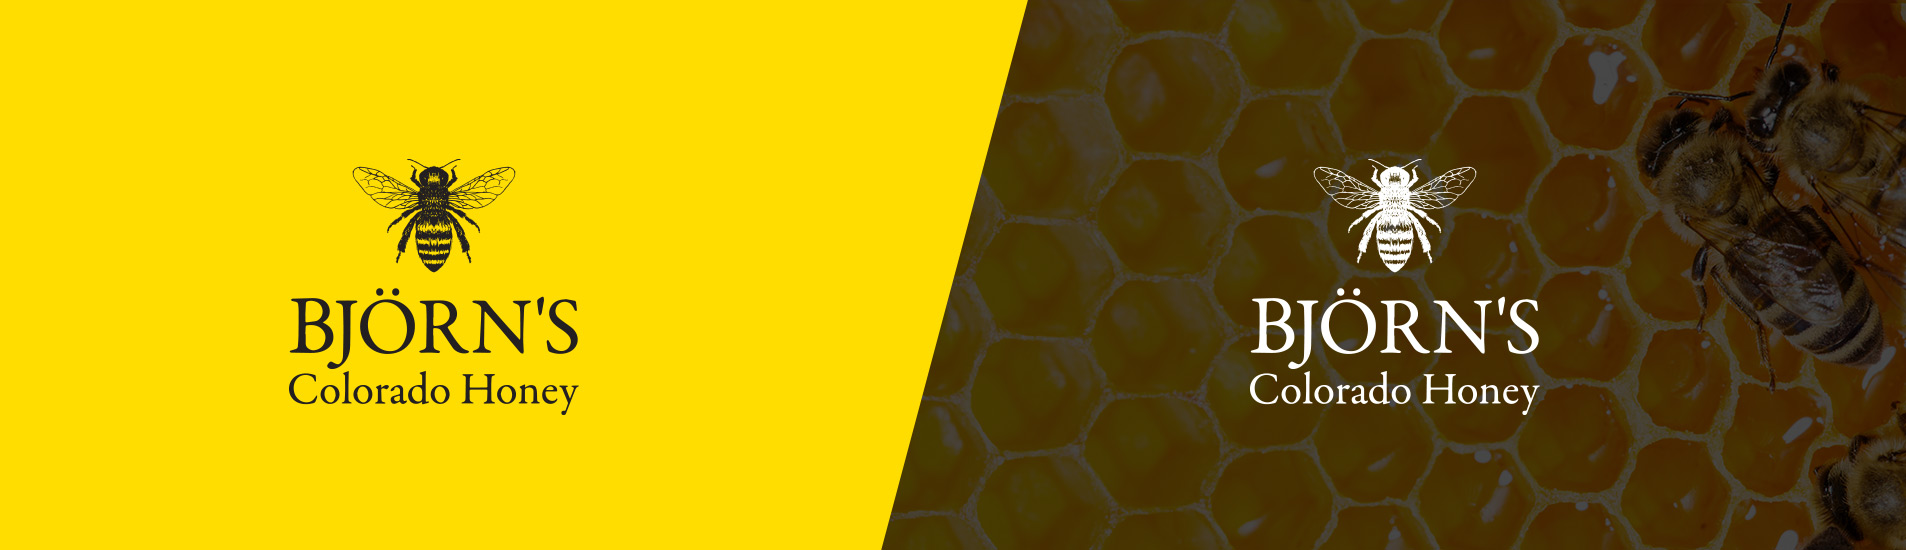 bjorns honey logo design